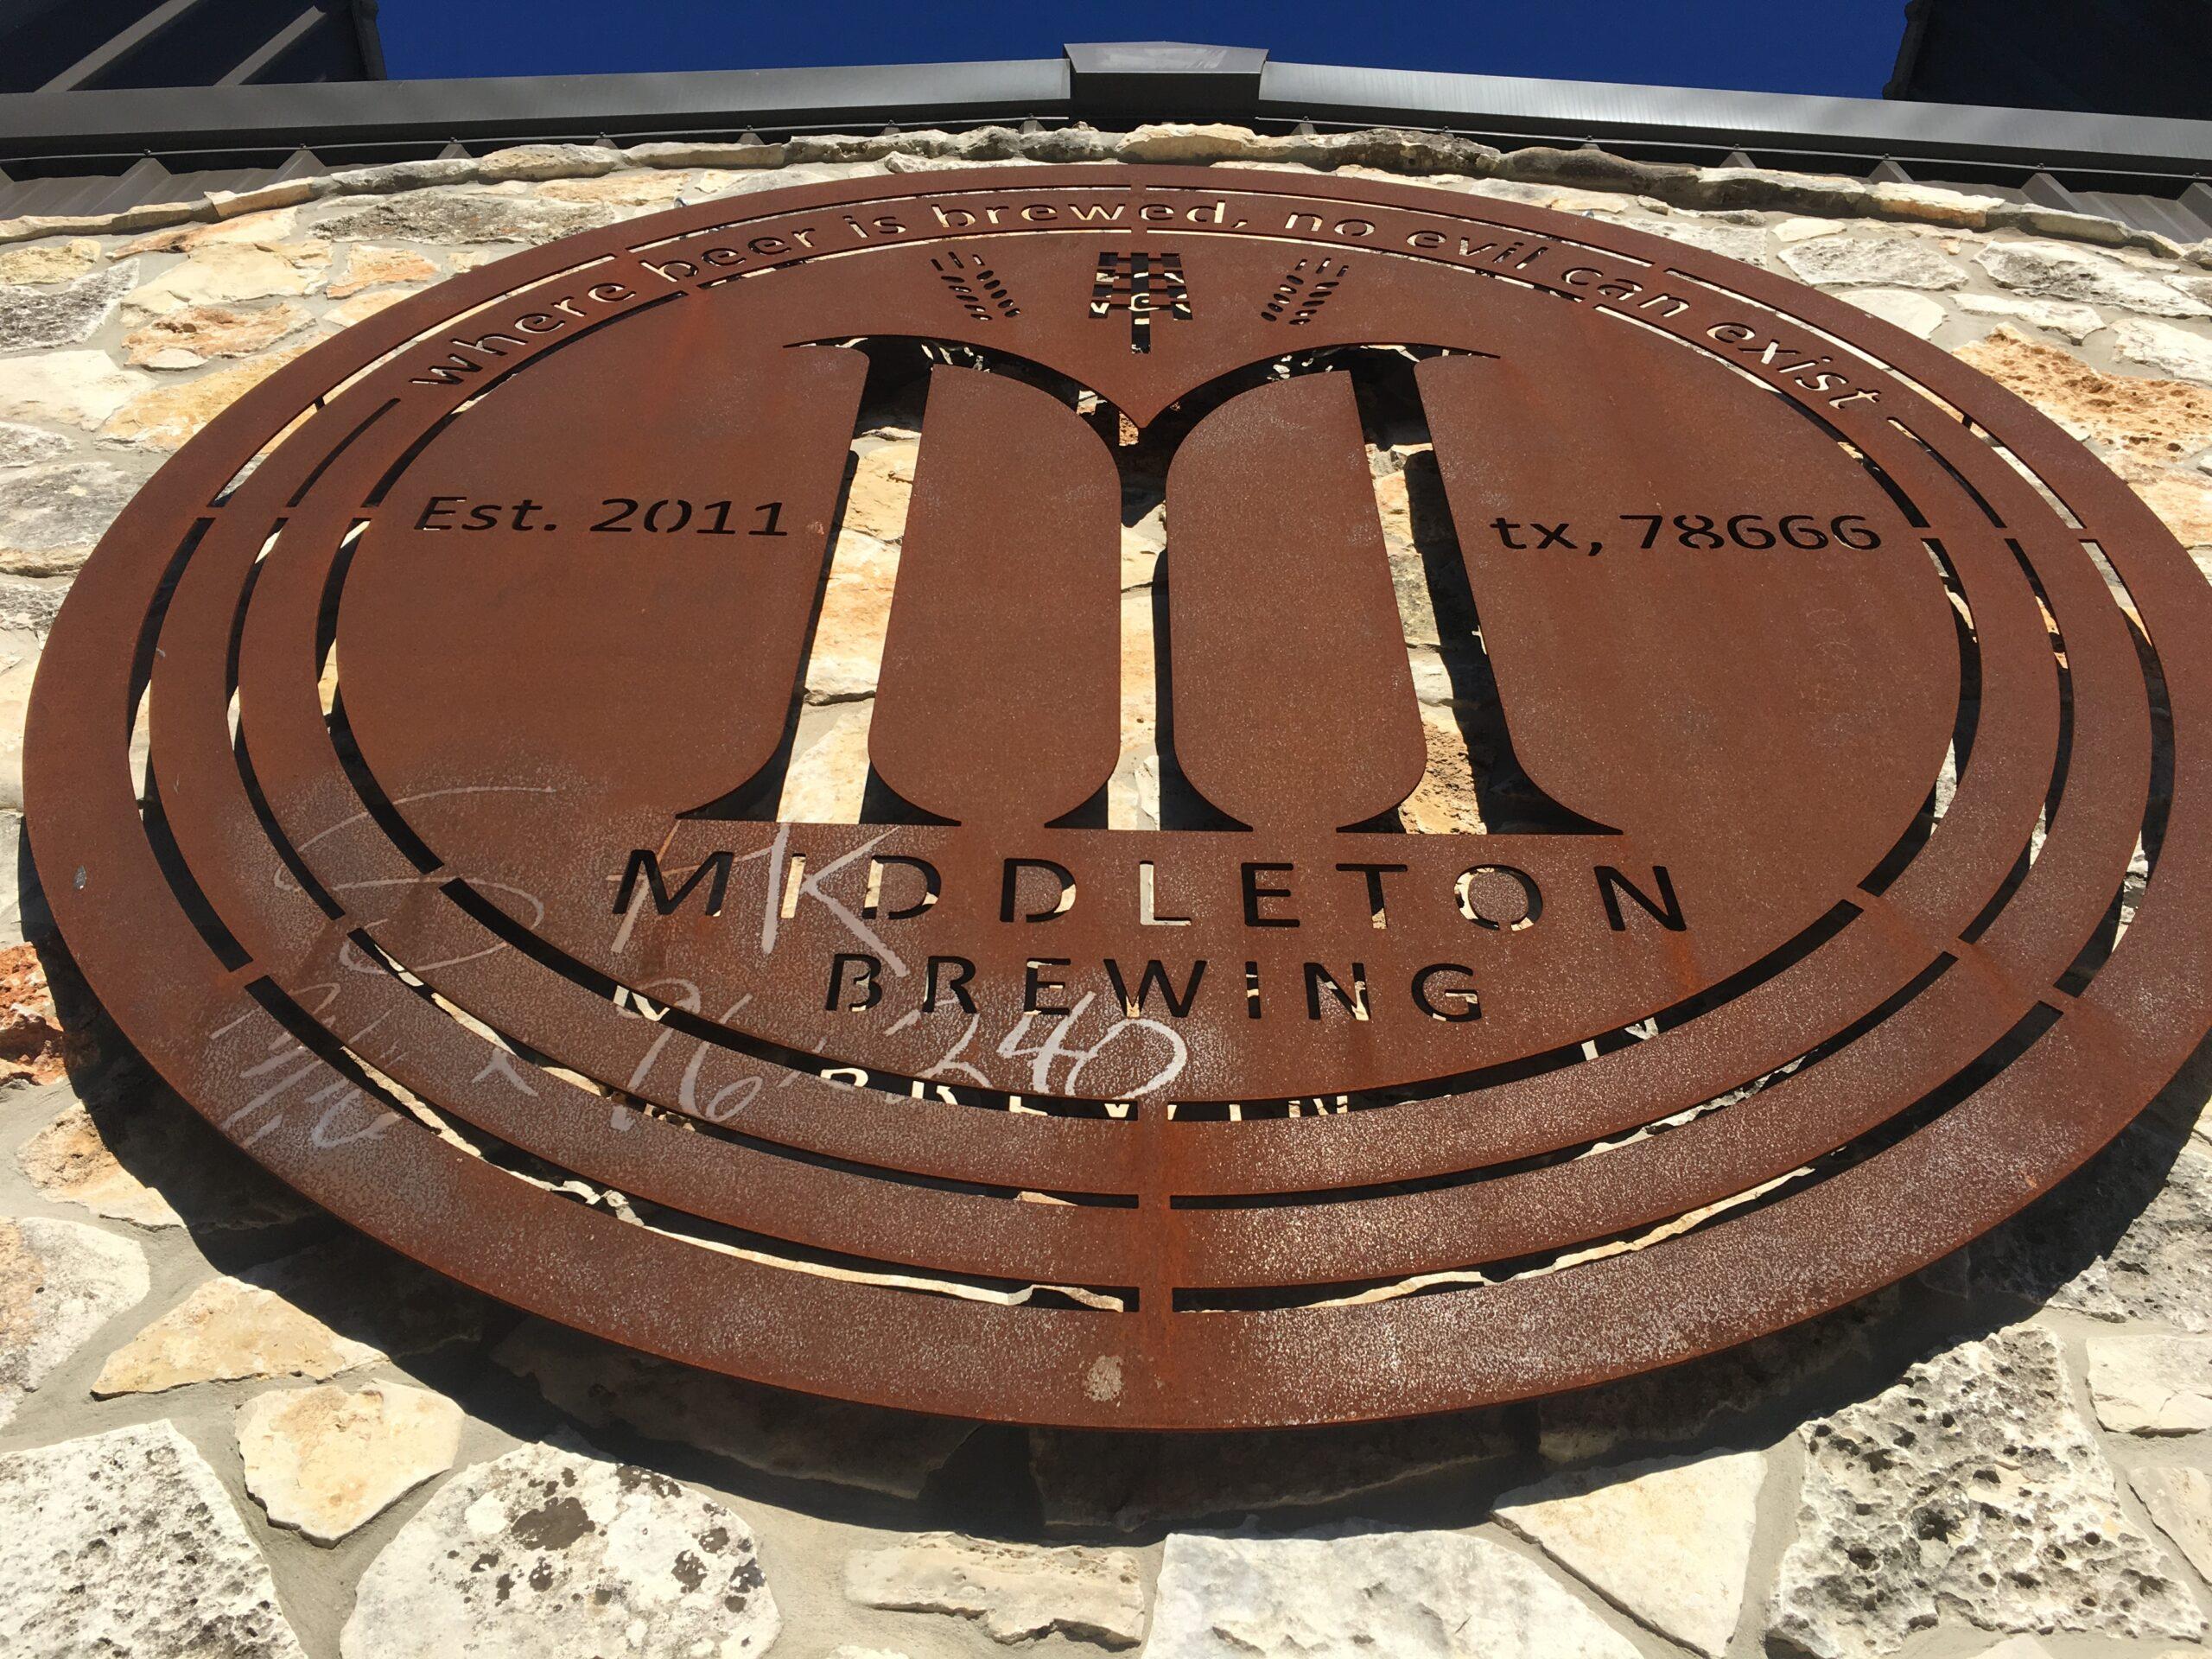 Middleton Brewing in San Marcos